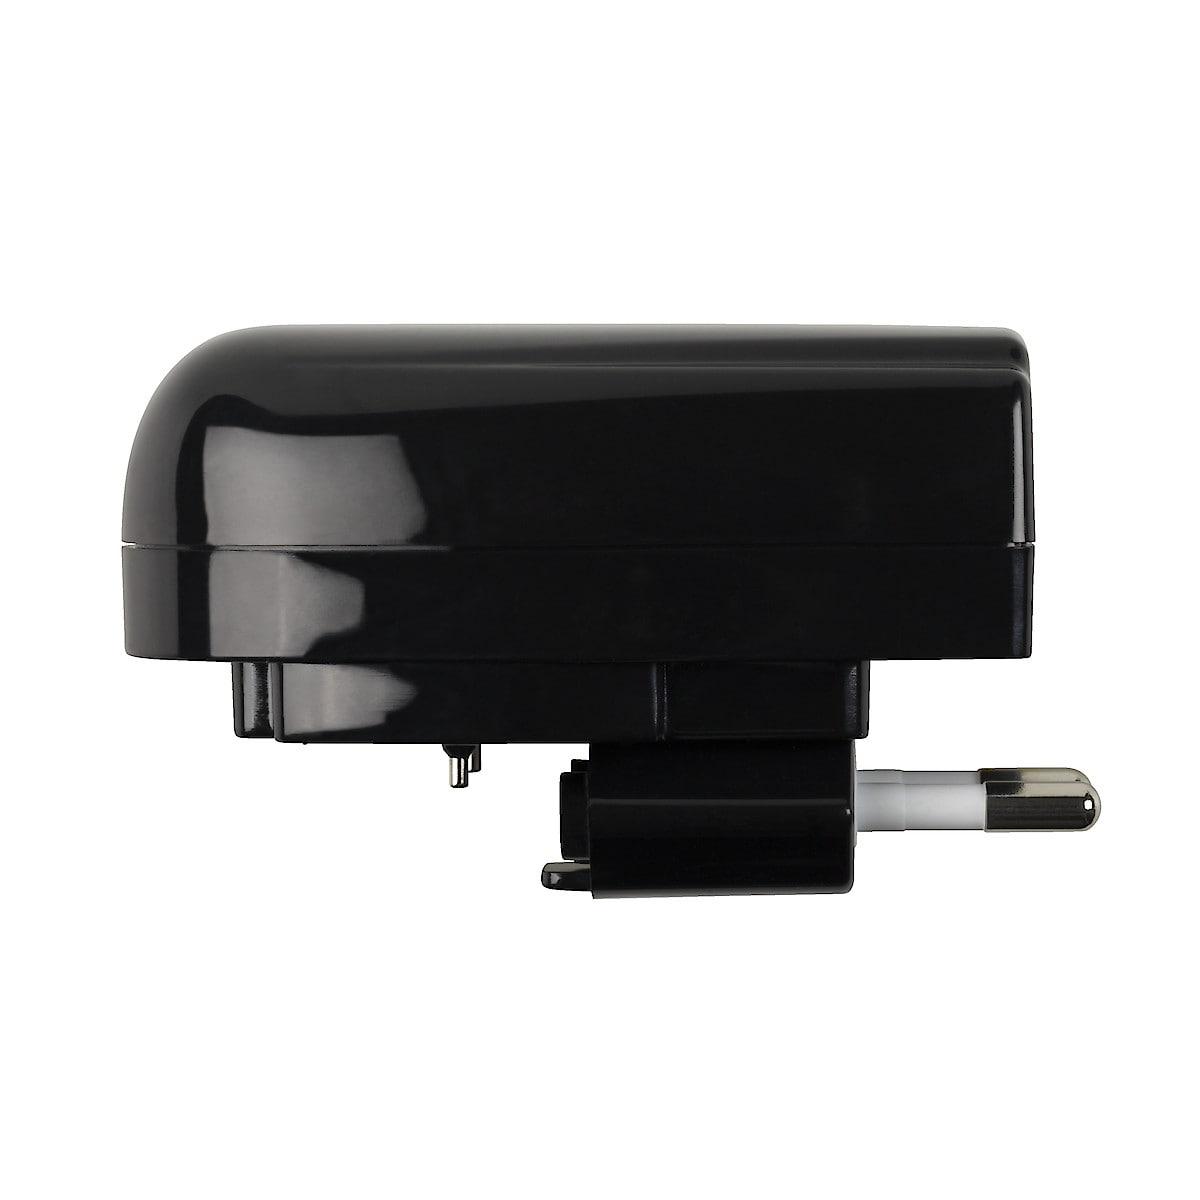 Batterieliminator med USB-uttag